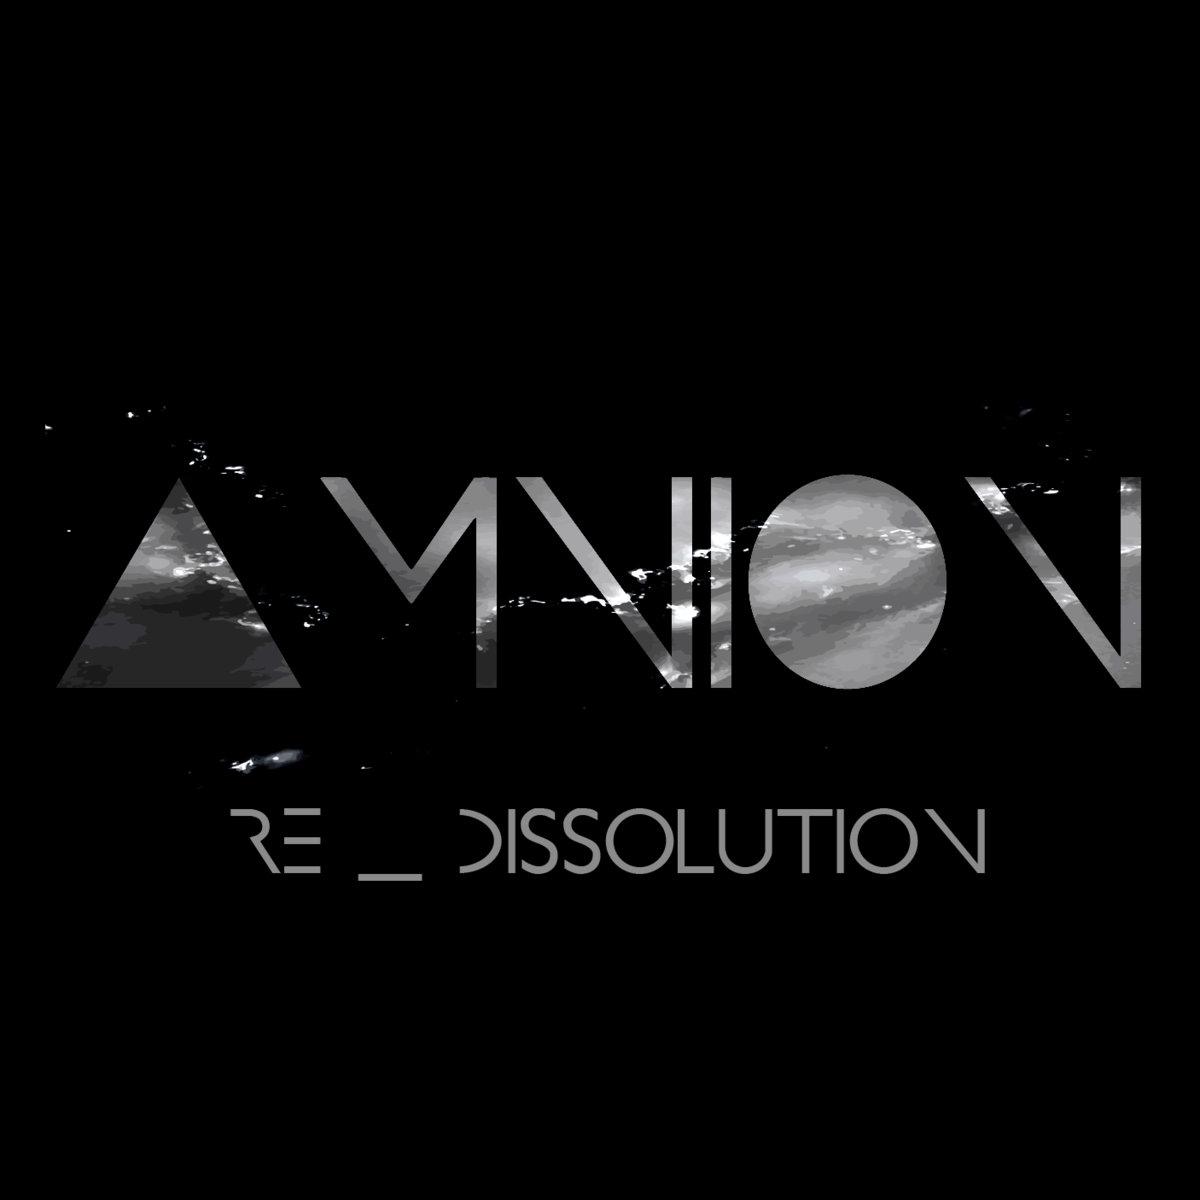 re_dissolution